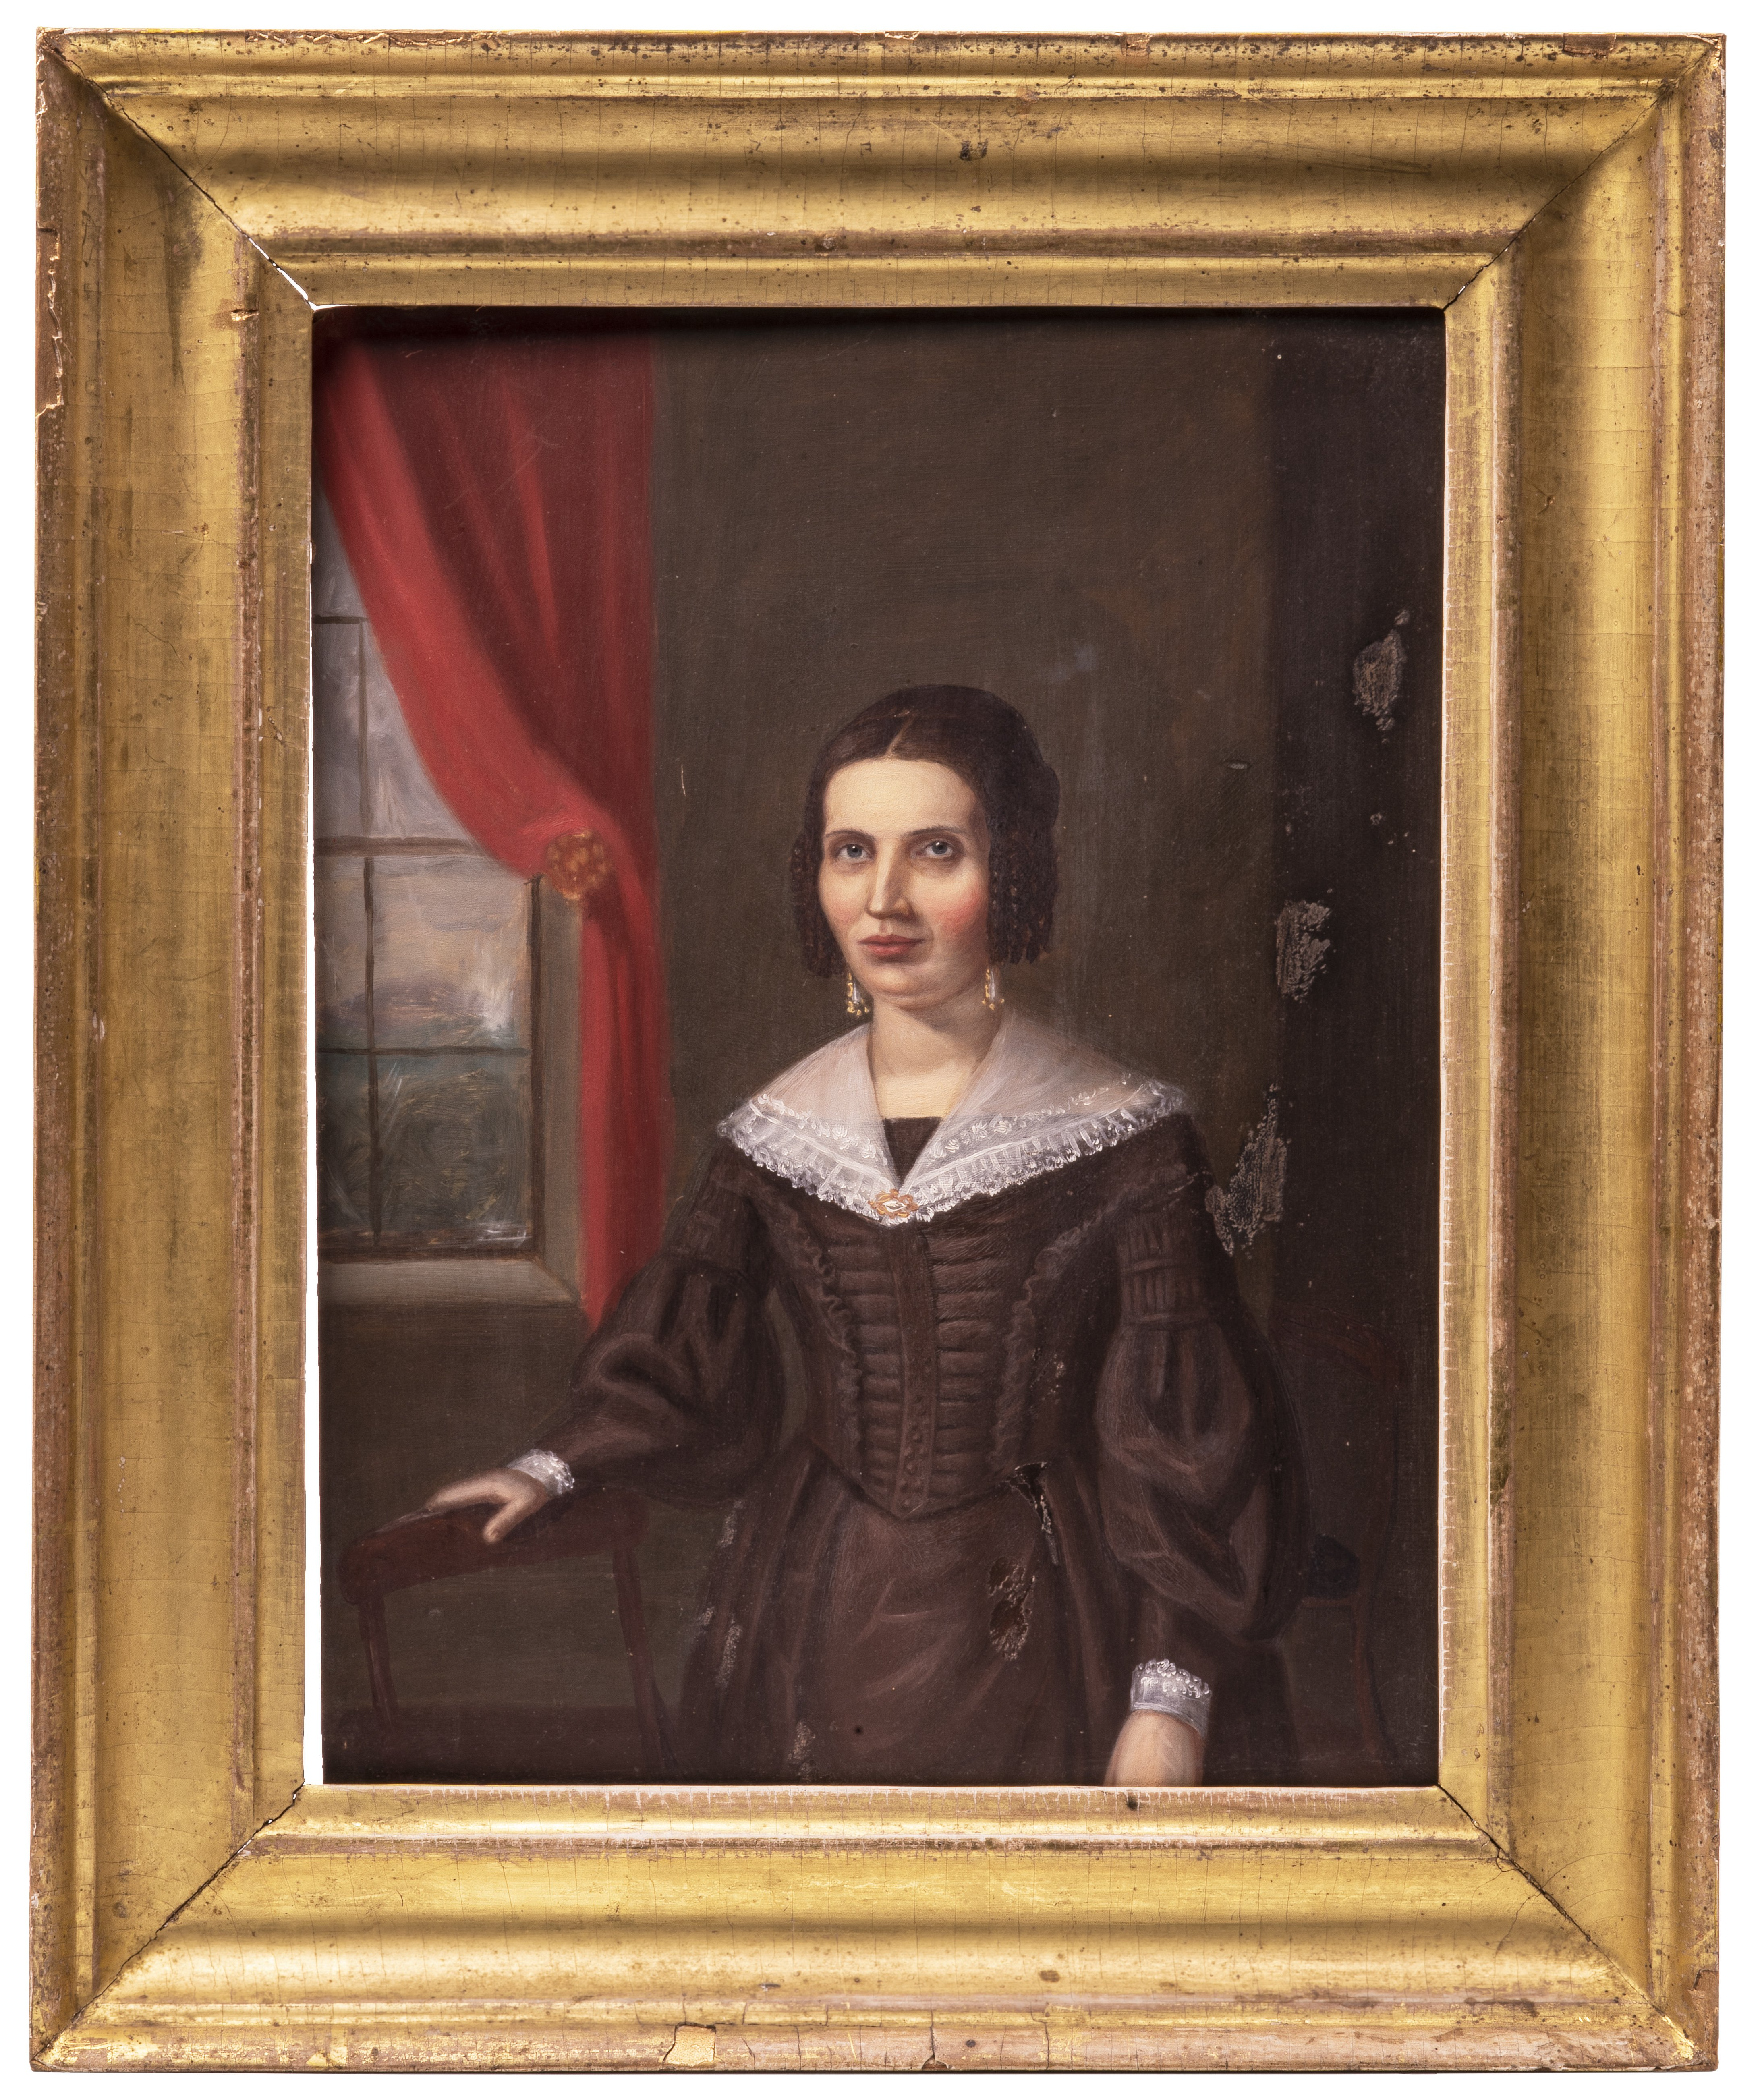 An Antique American Folk Art Portrait Manner of John Ritto Penniman